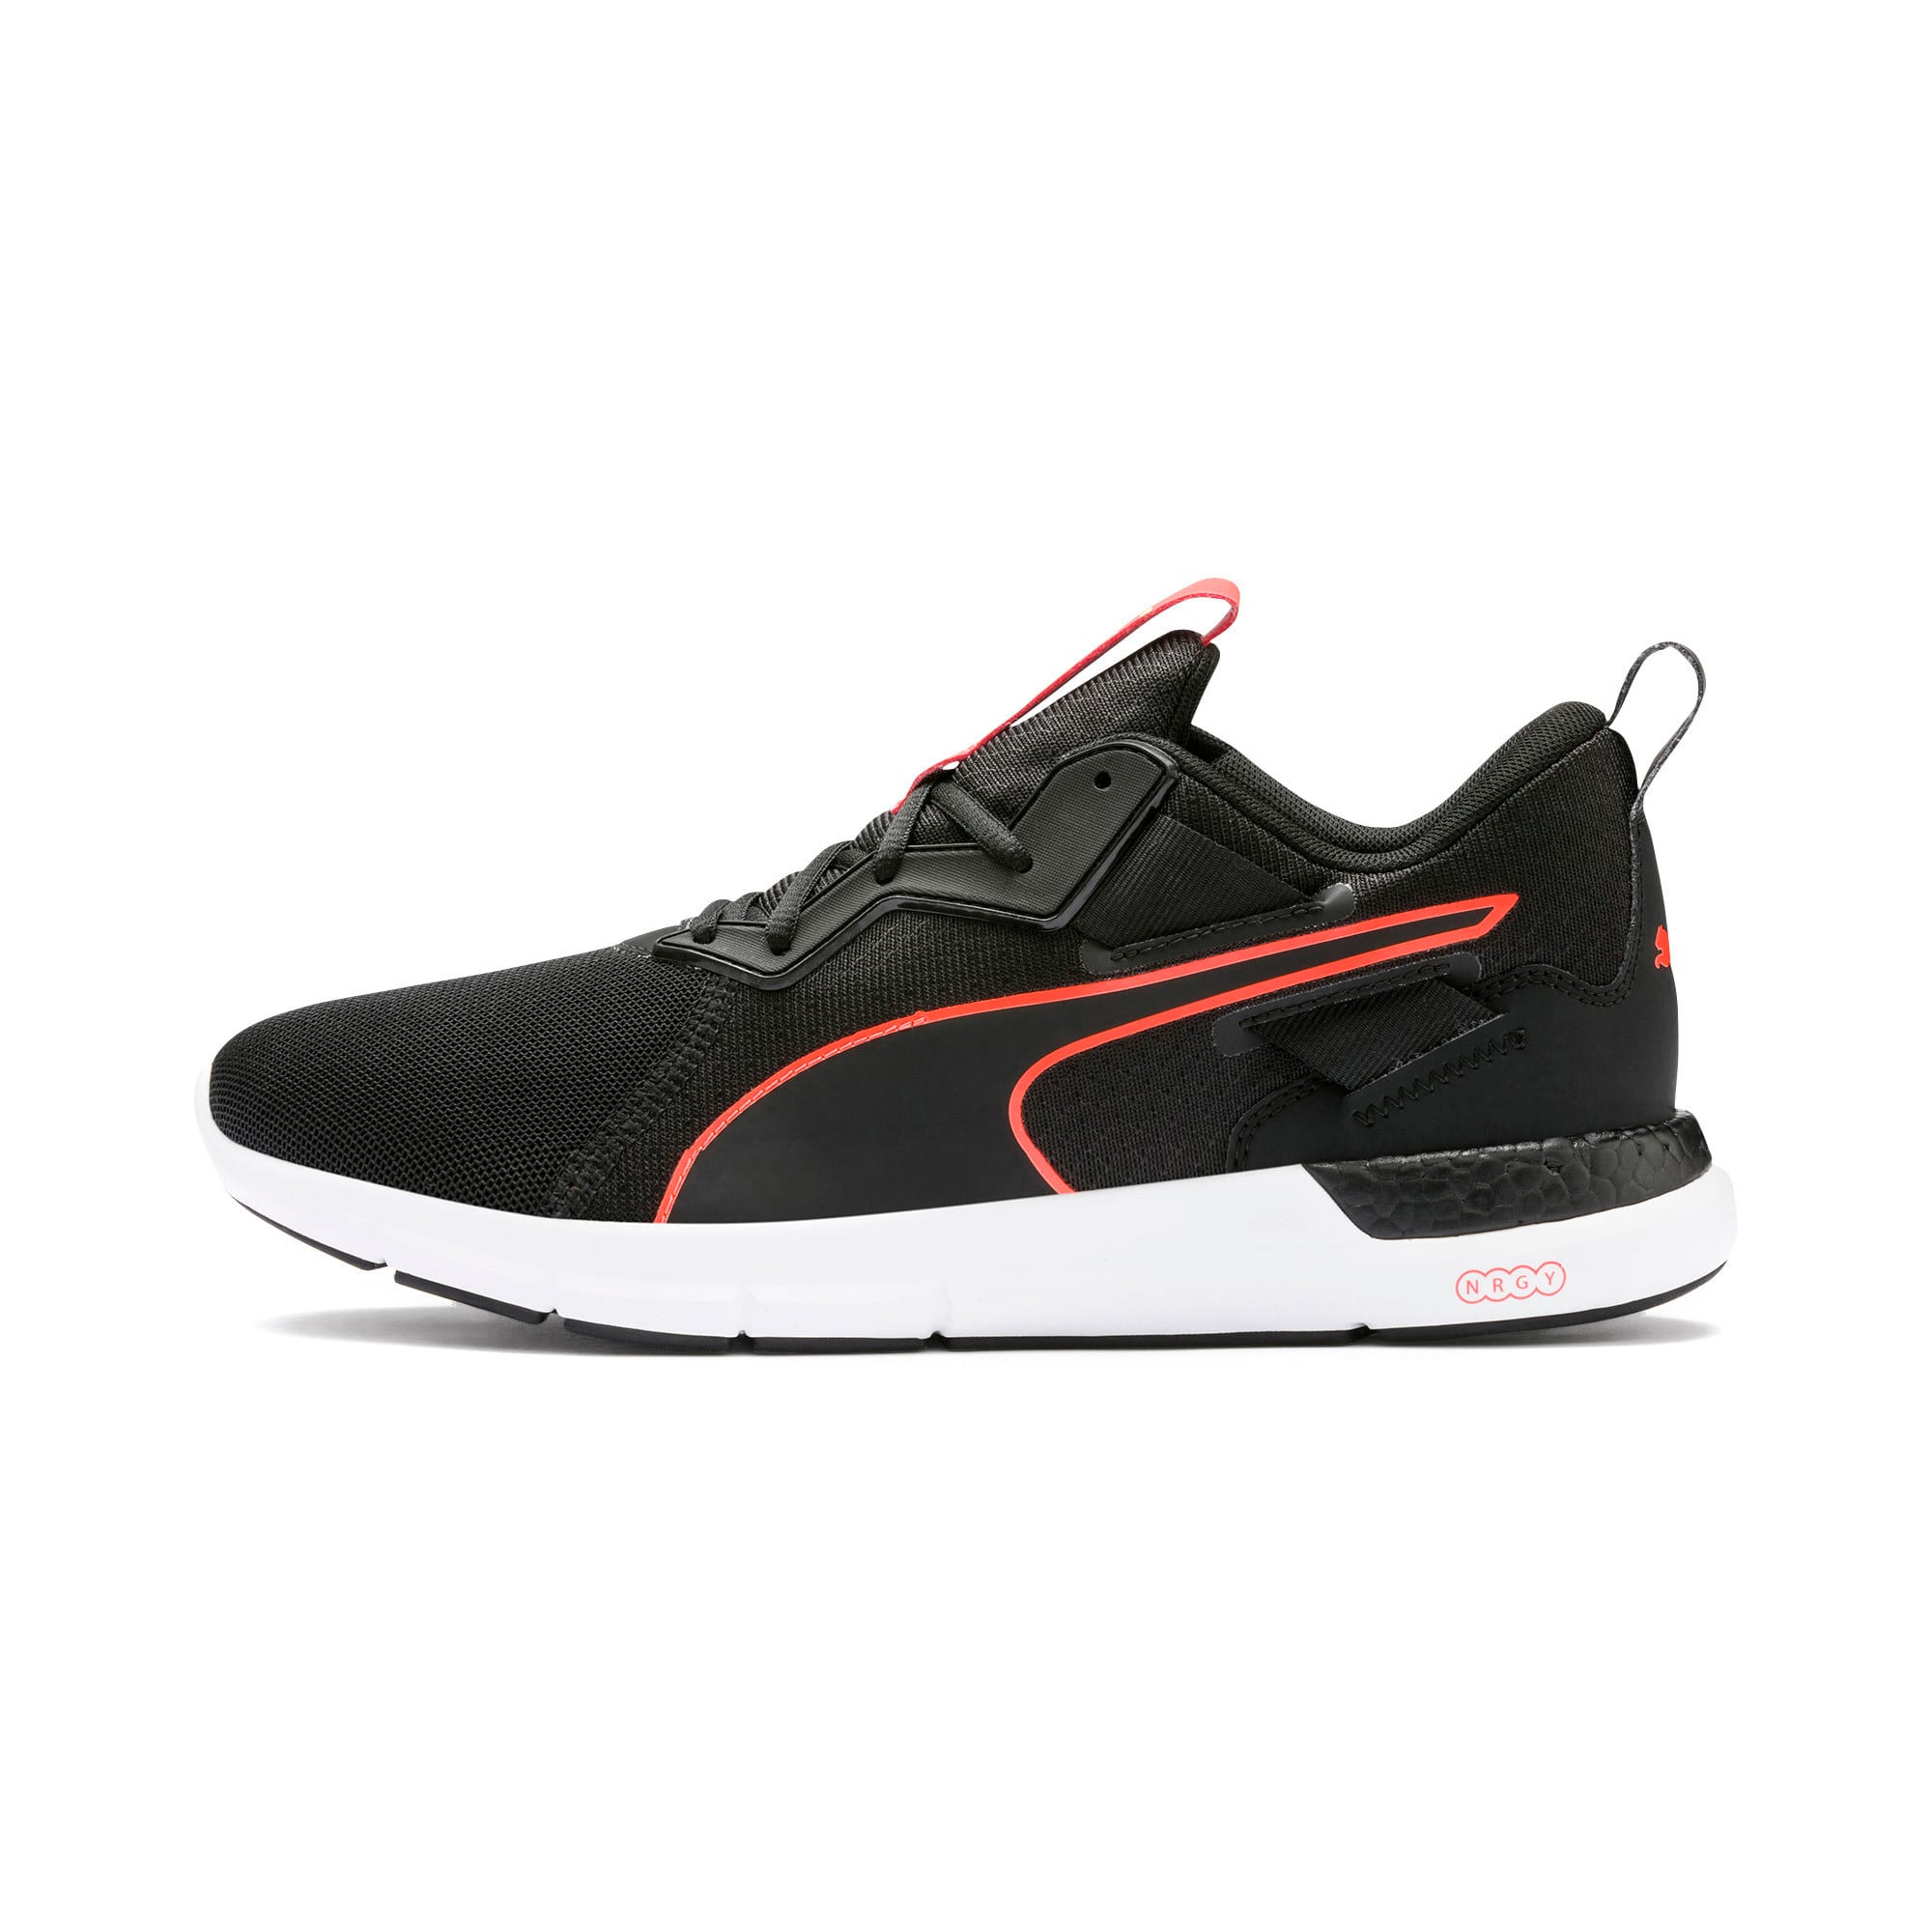 Thumbnail 1 of NRGY Dynamo Futuro Men's Running Shoes, Puma Black-Nrgy Red, medium